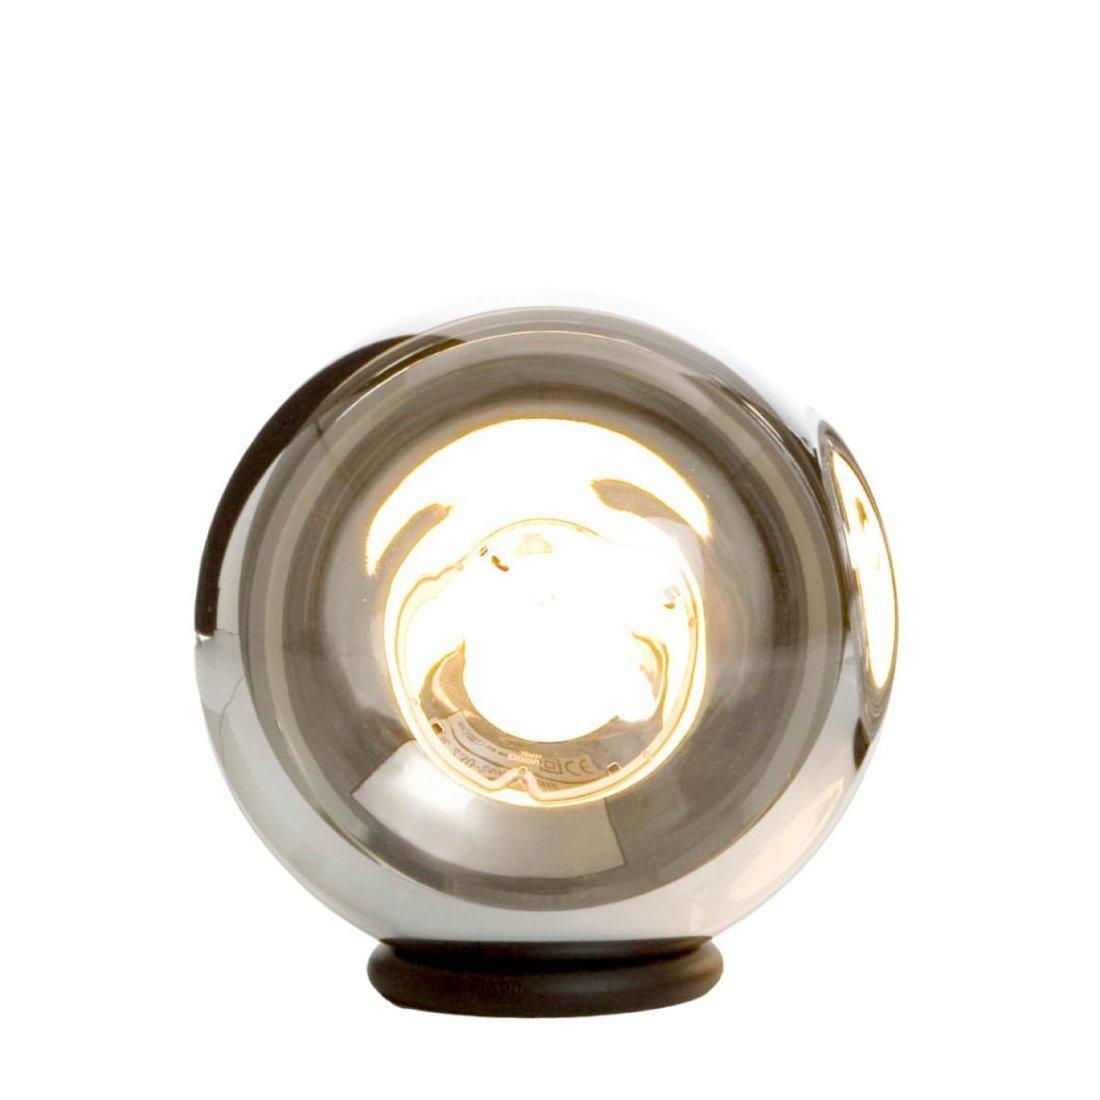 Tom Dixon Mirror Ball Vloerlamp � 25 cm